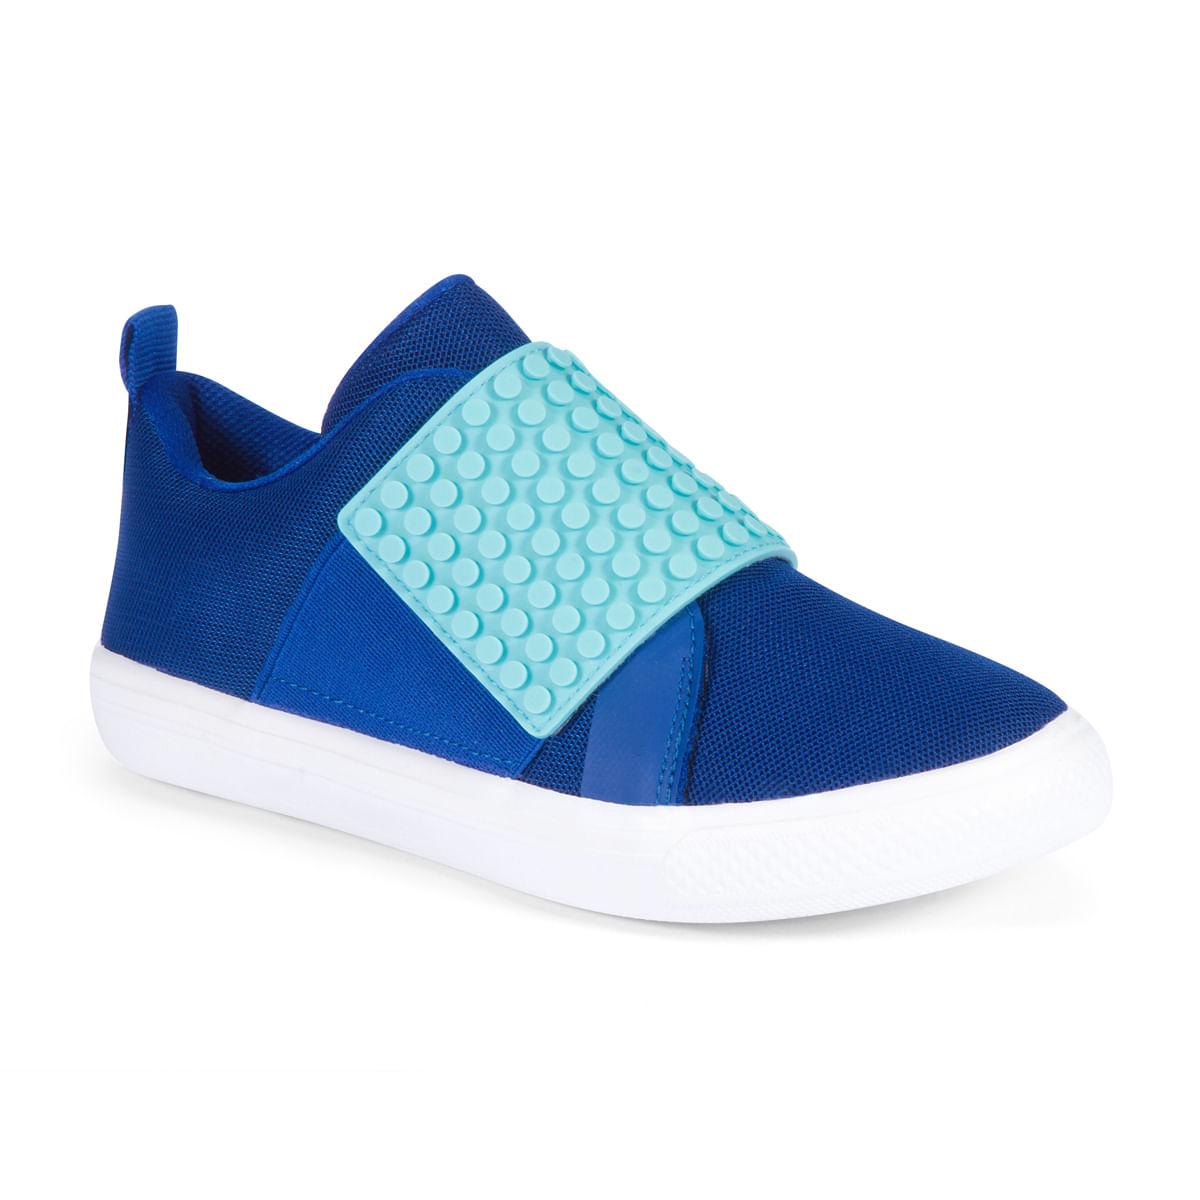 Tênis Infantil Masculino Azul Upixel 1075003 - Bibi Calçados 8aad1e19332c1